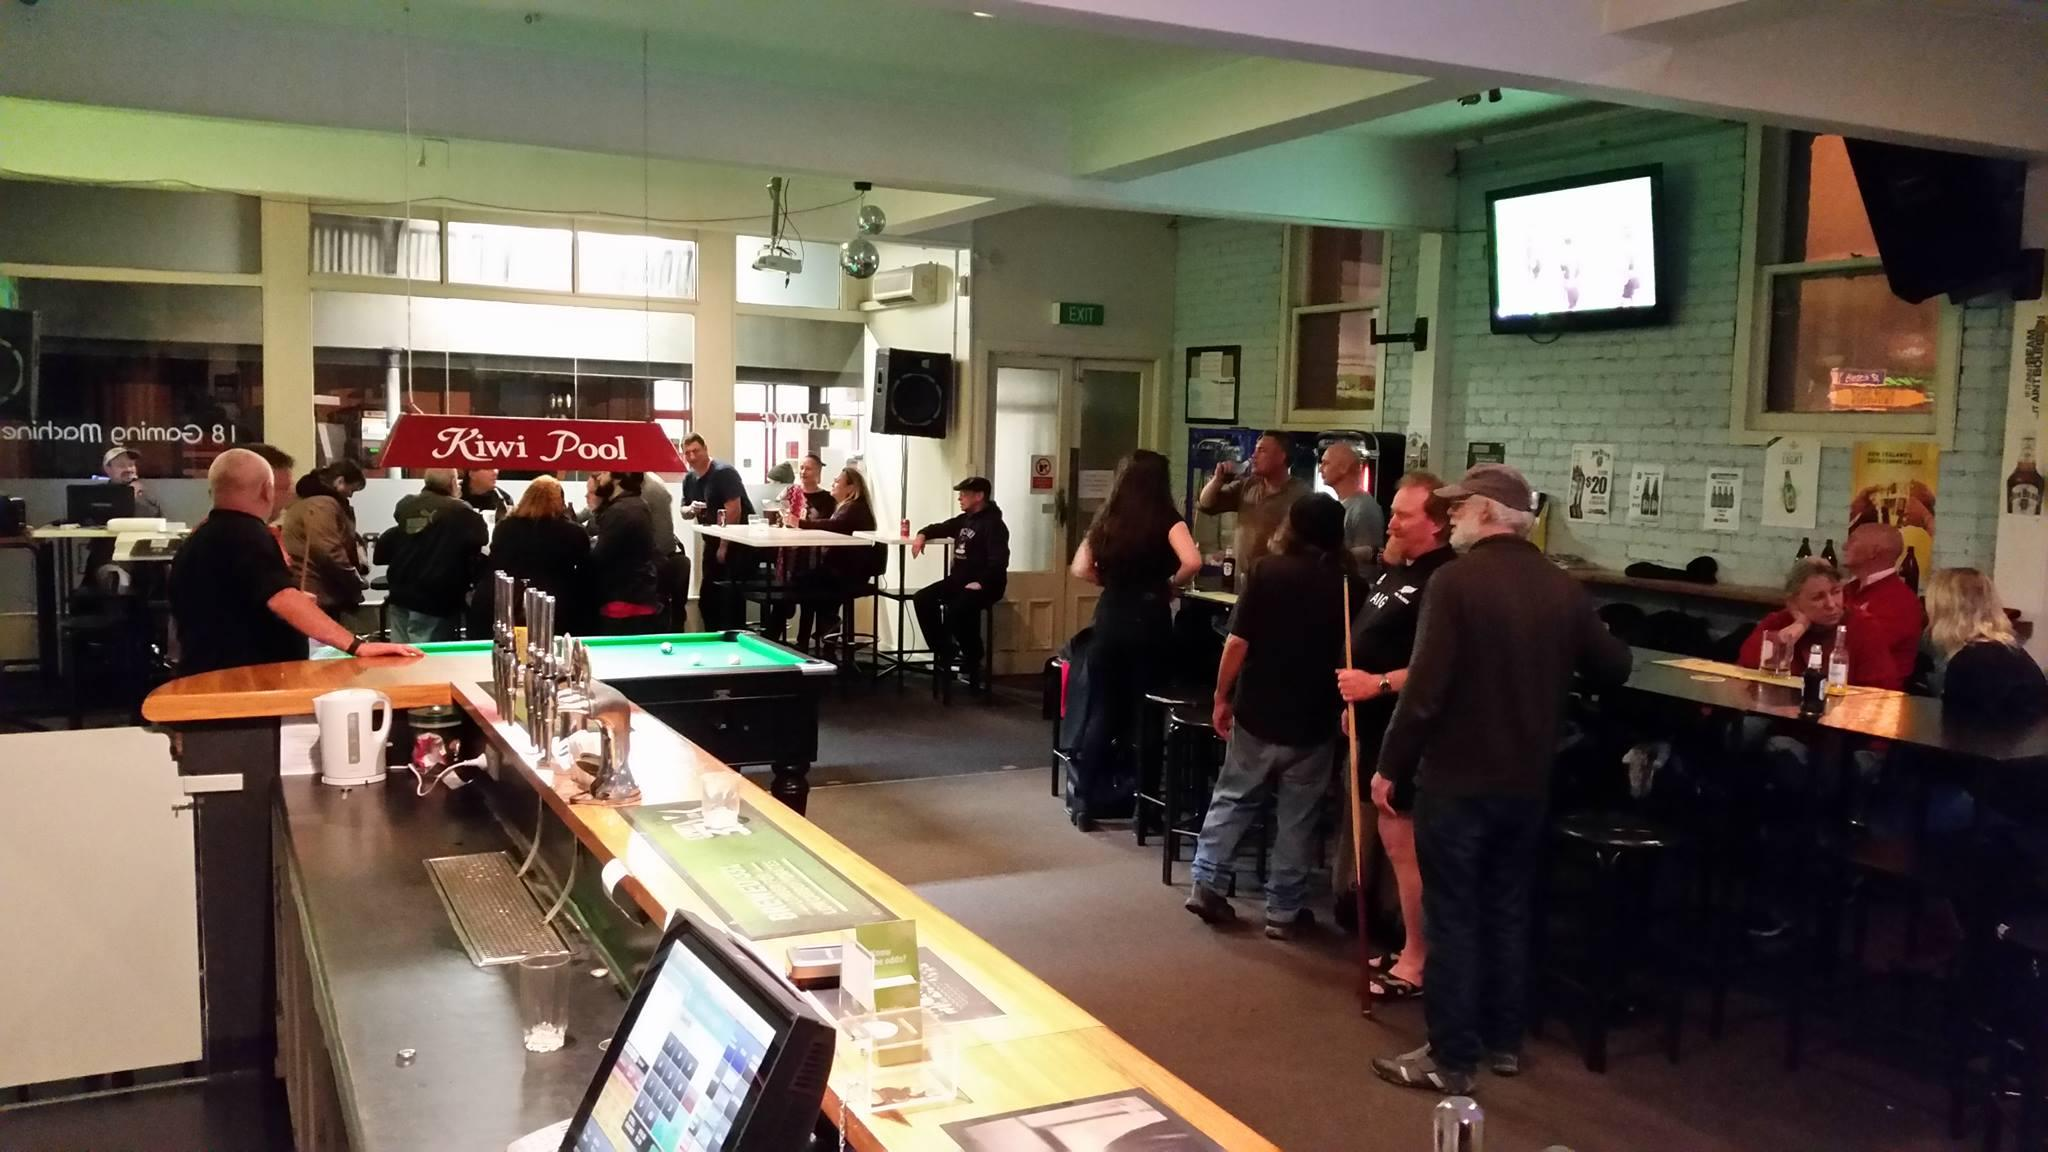 Petone Sports Bar